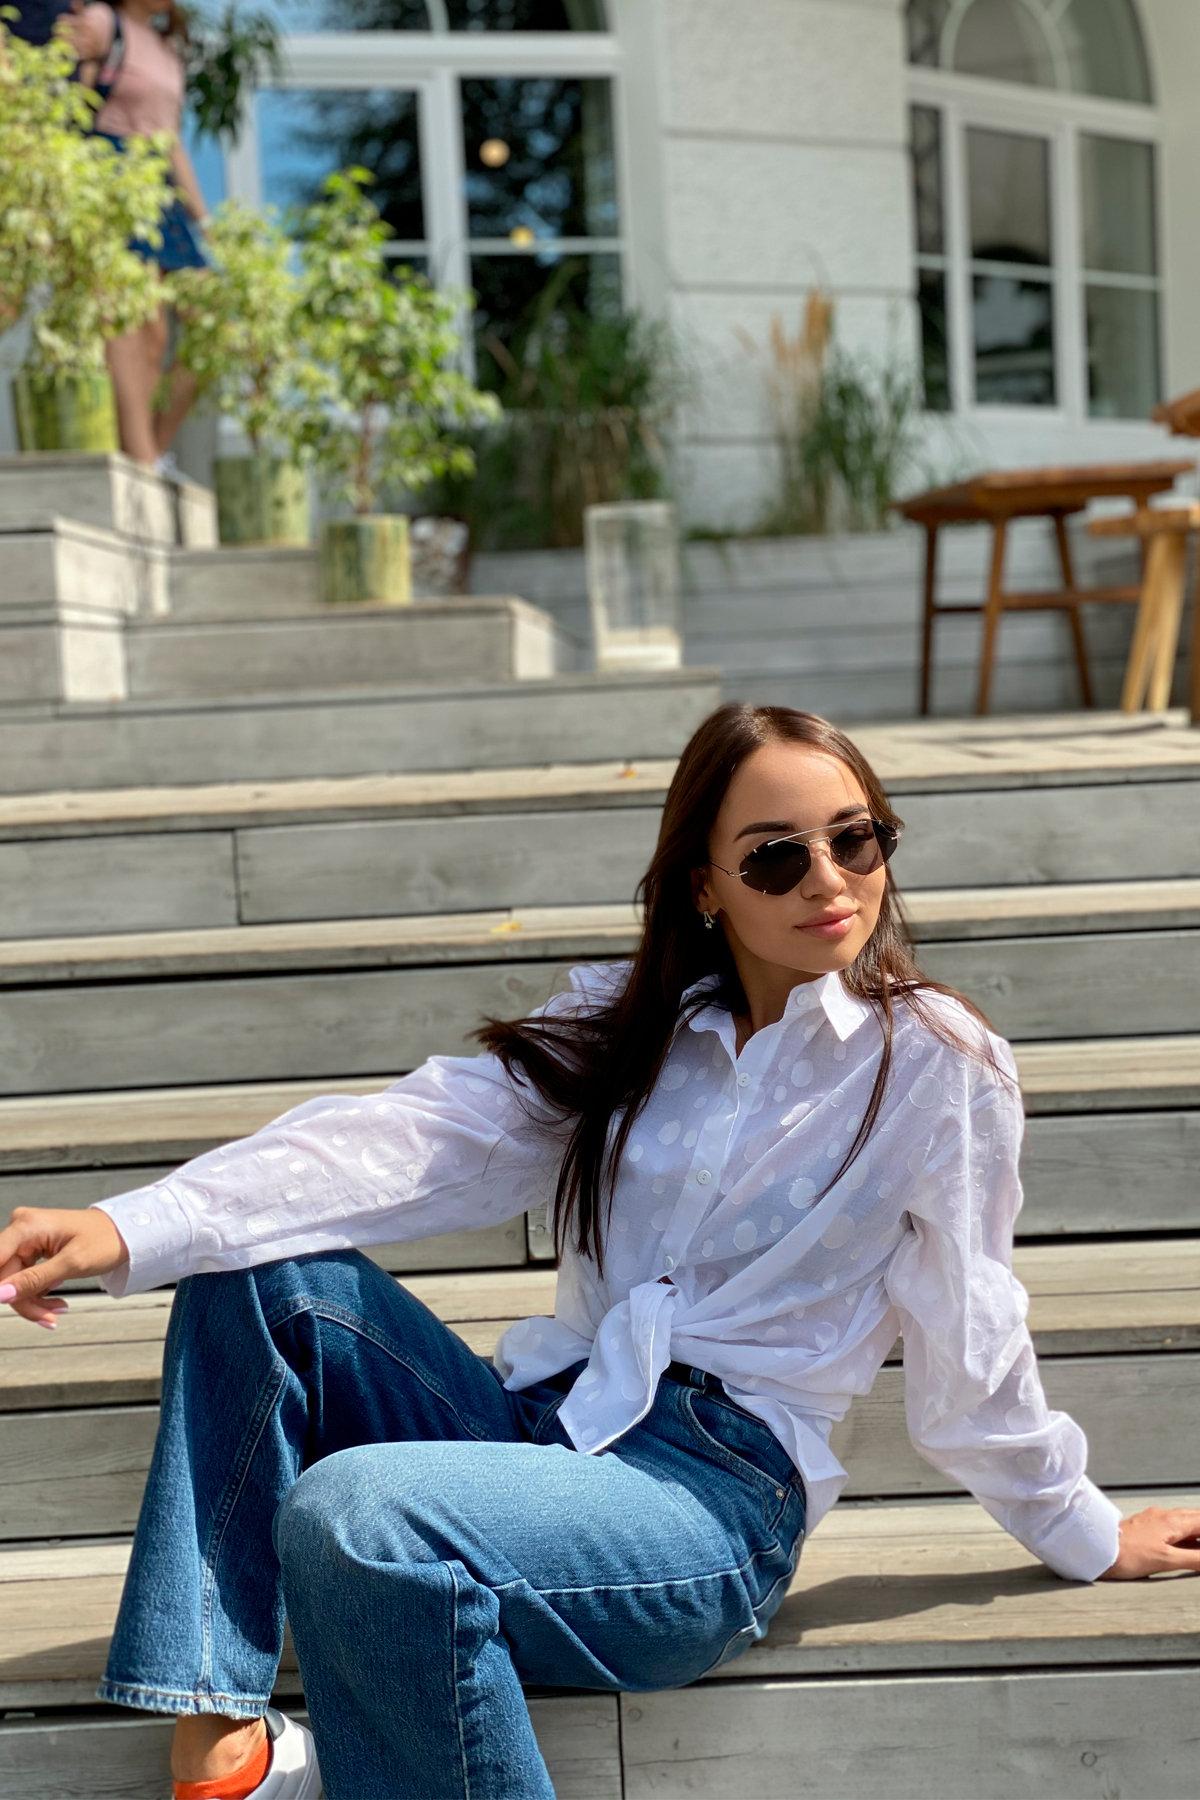 Блуза Эйплс 96242 АРТ. 45930 Цвет: Белый - фото 2, интернет магазин tm-modus.ru